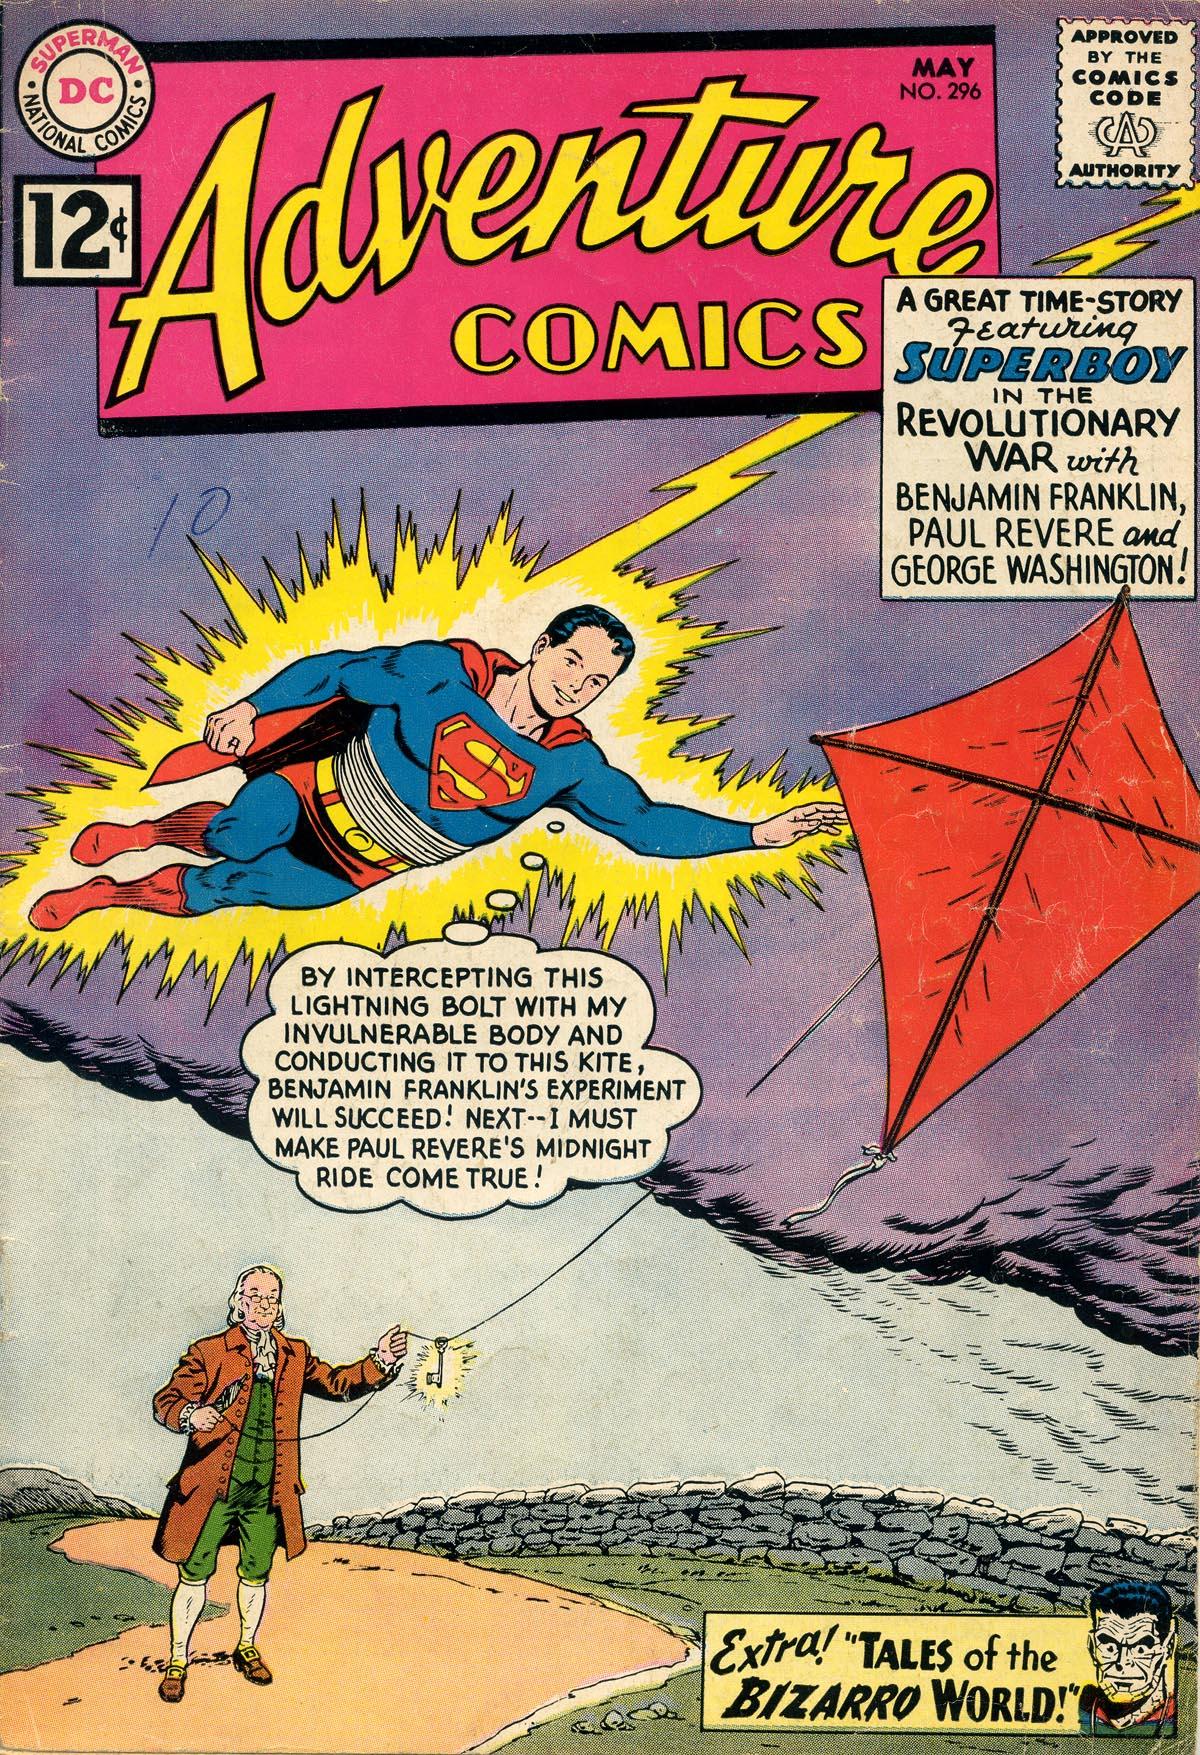 Read online Adventure Comics (1938) comic -  Issue #296 - 1